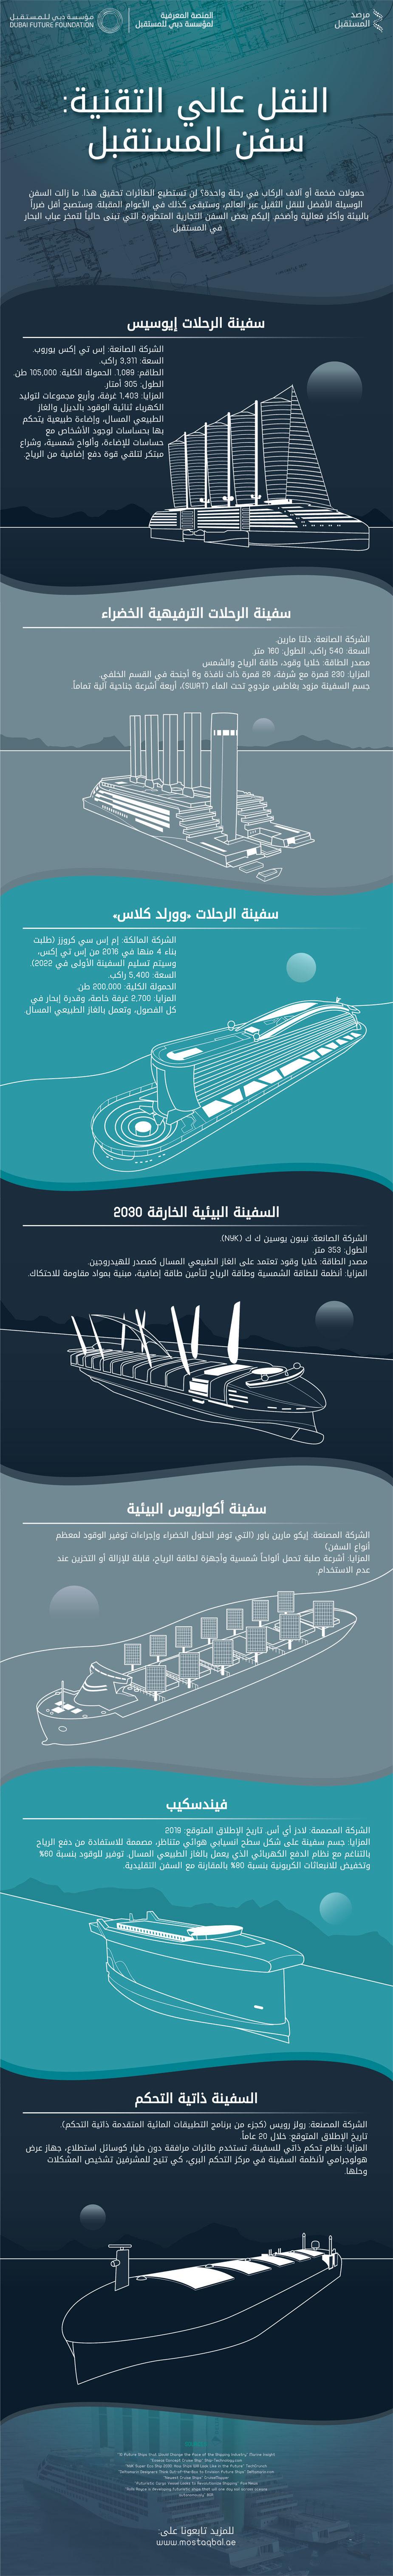 future-ships